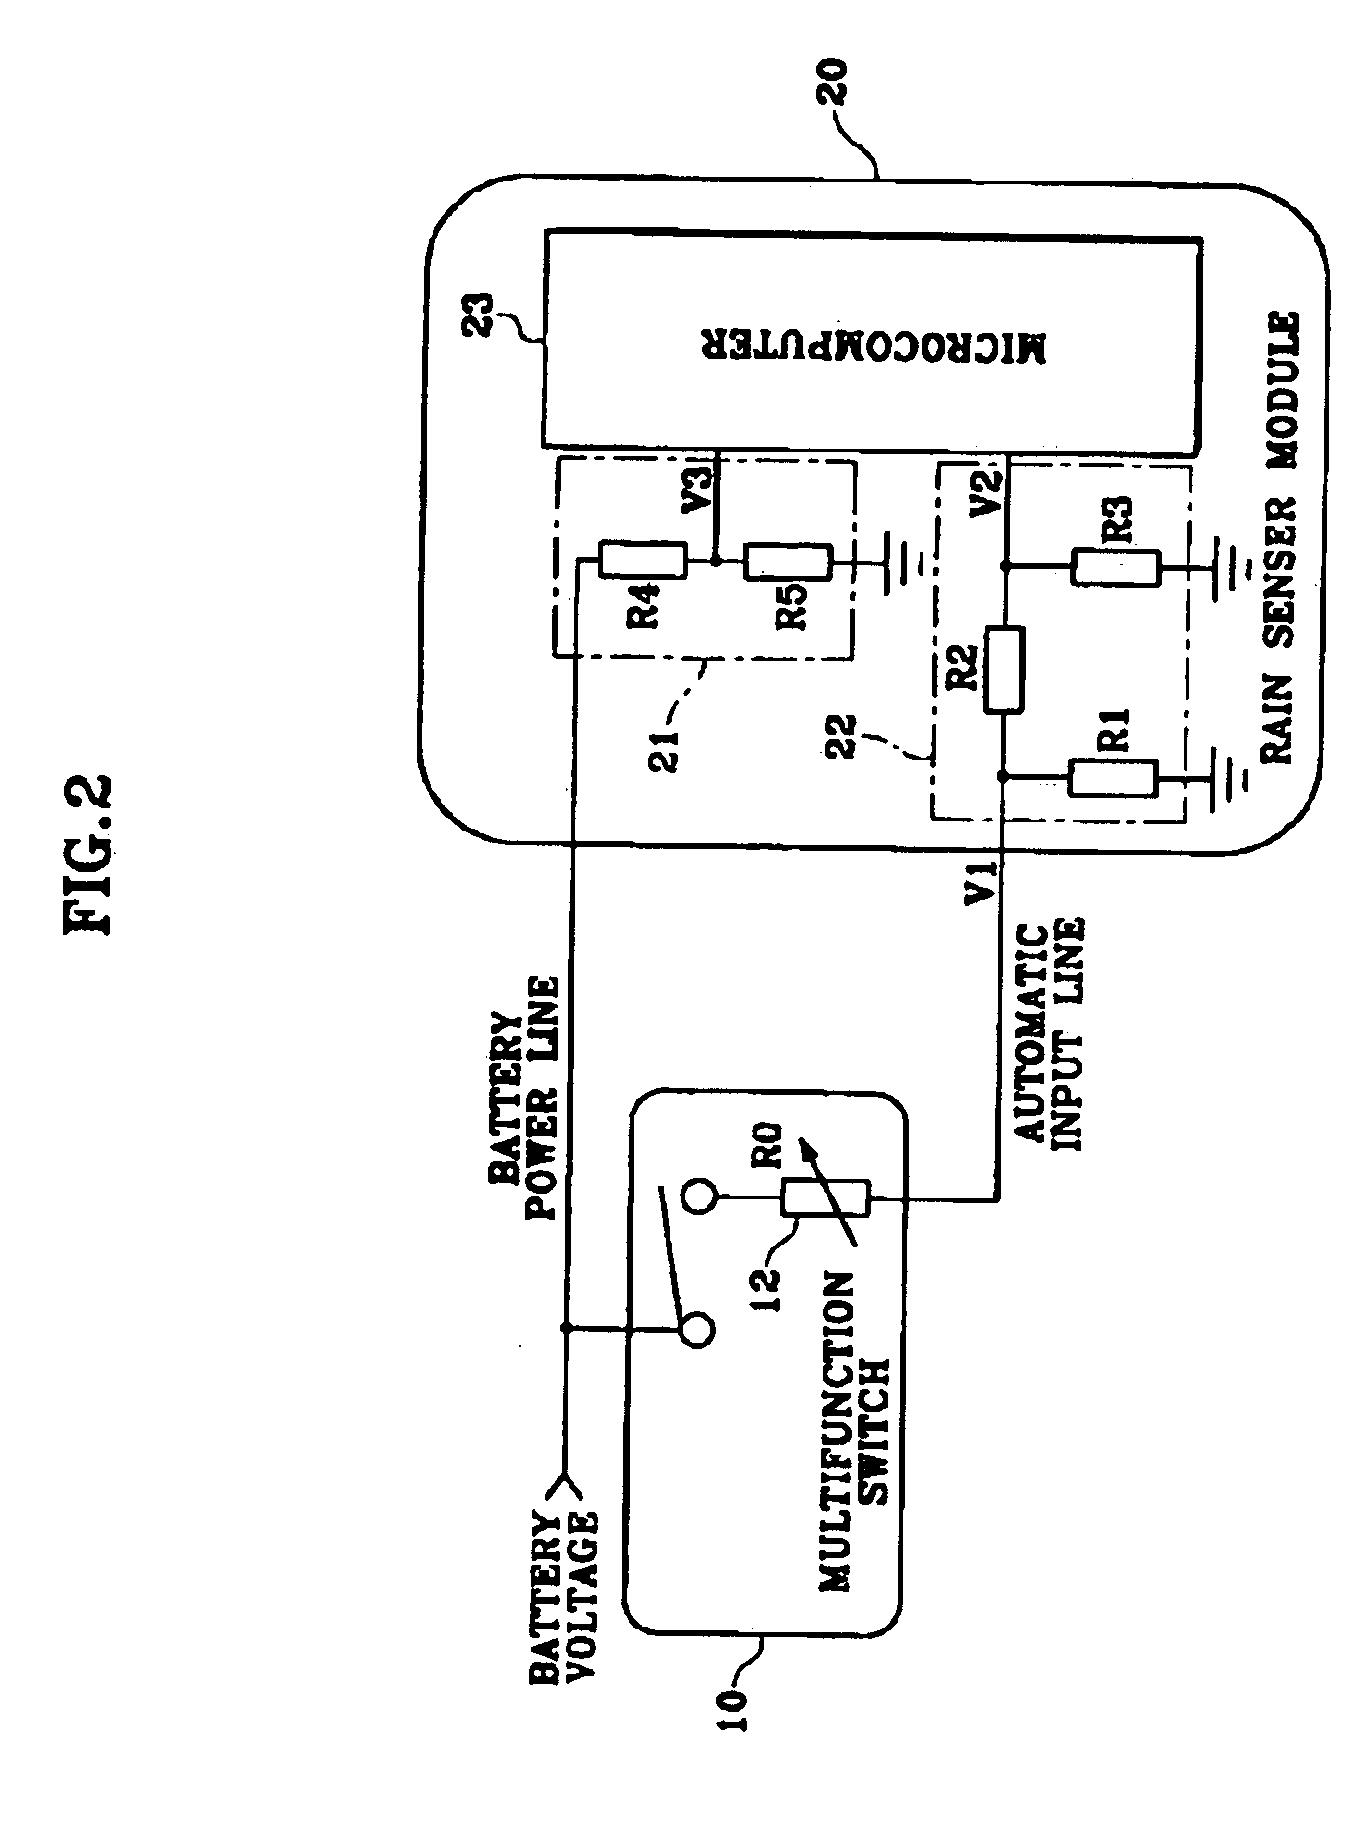 hight resolution of valeo wiper motor wiring diagram wiring diagramwrg 7792 hq holden wiper motor wiring diagramawesome valeo